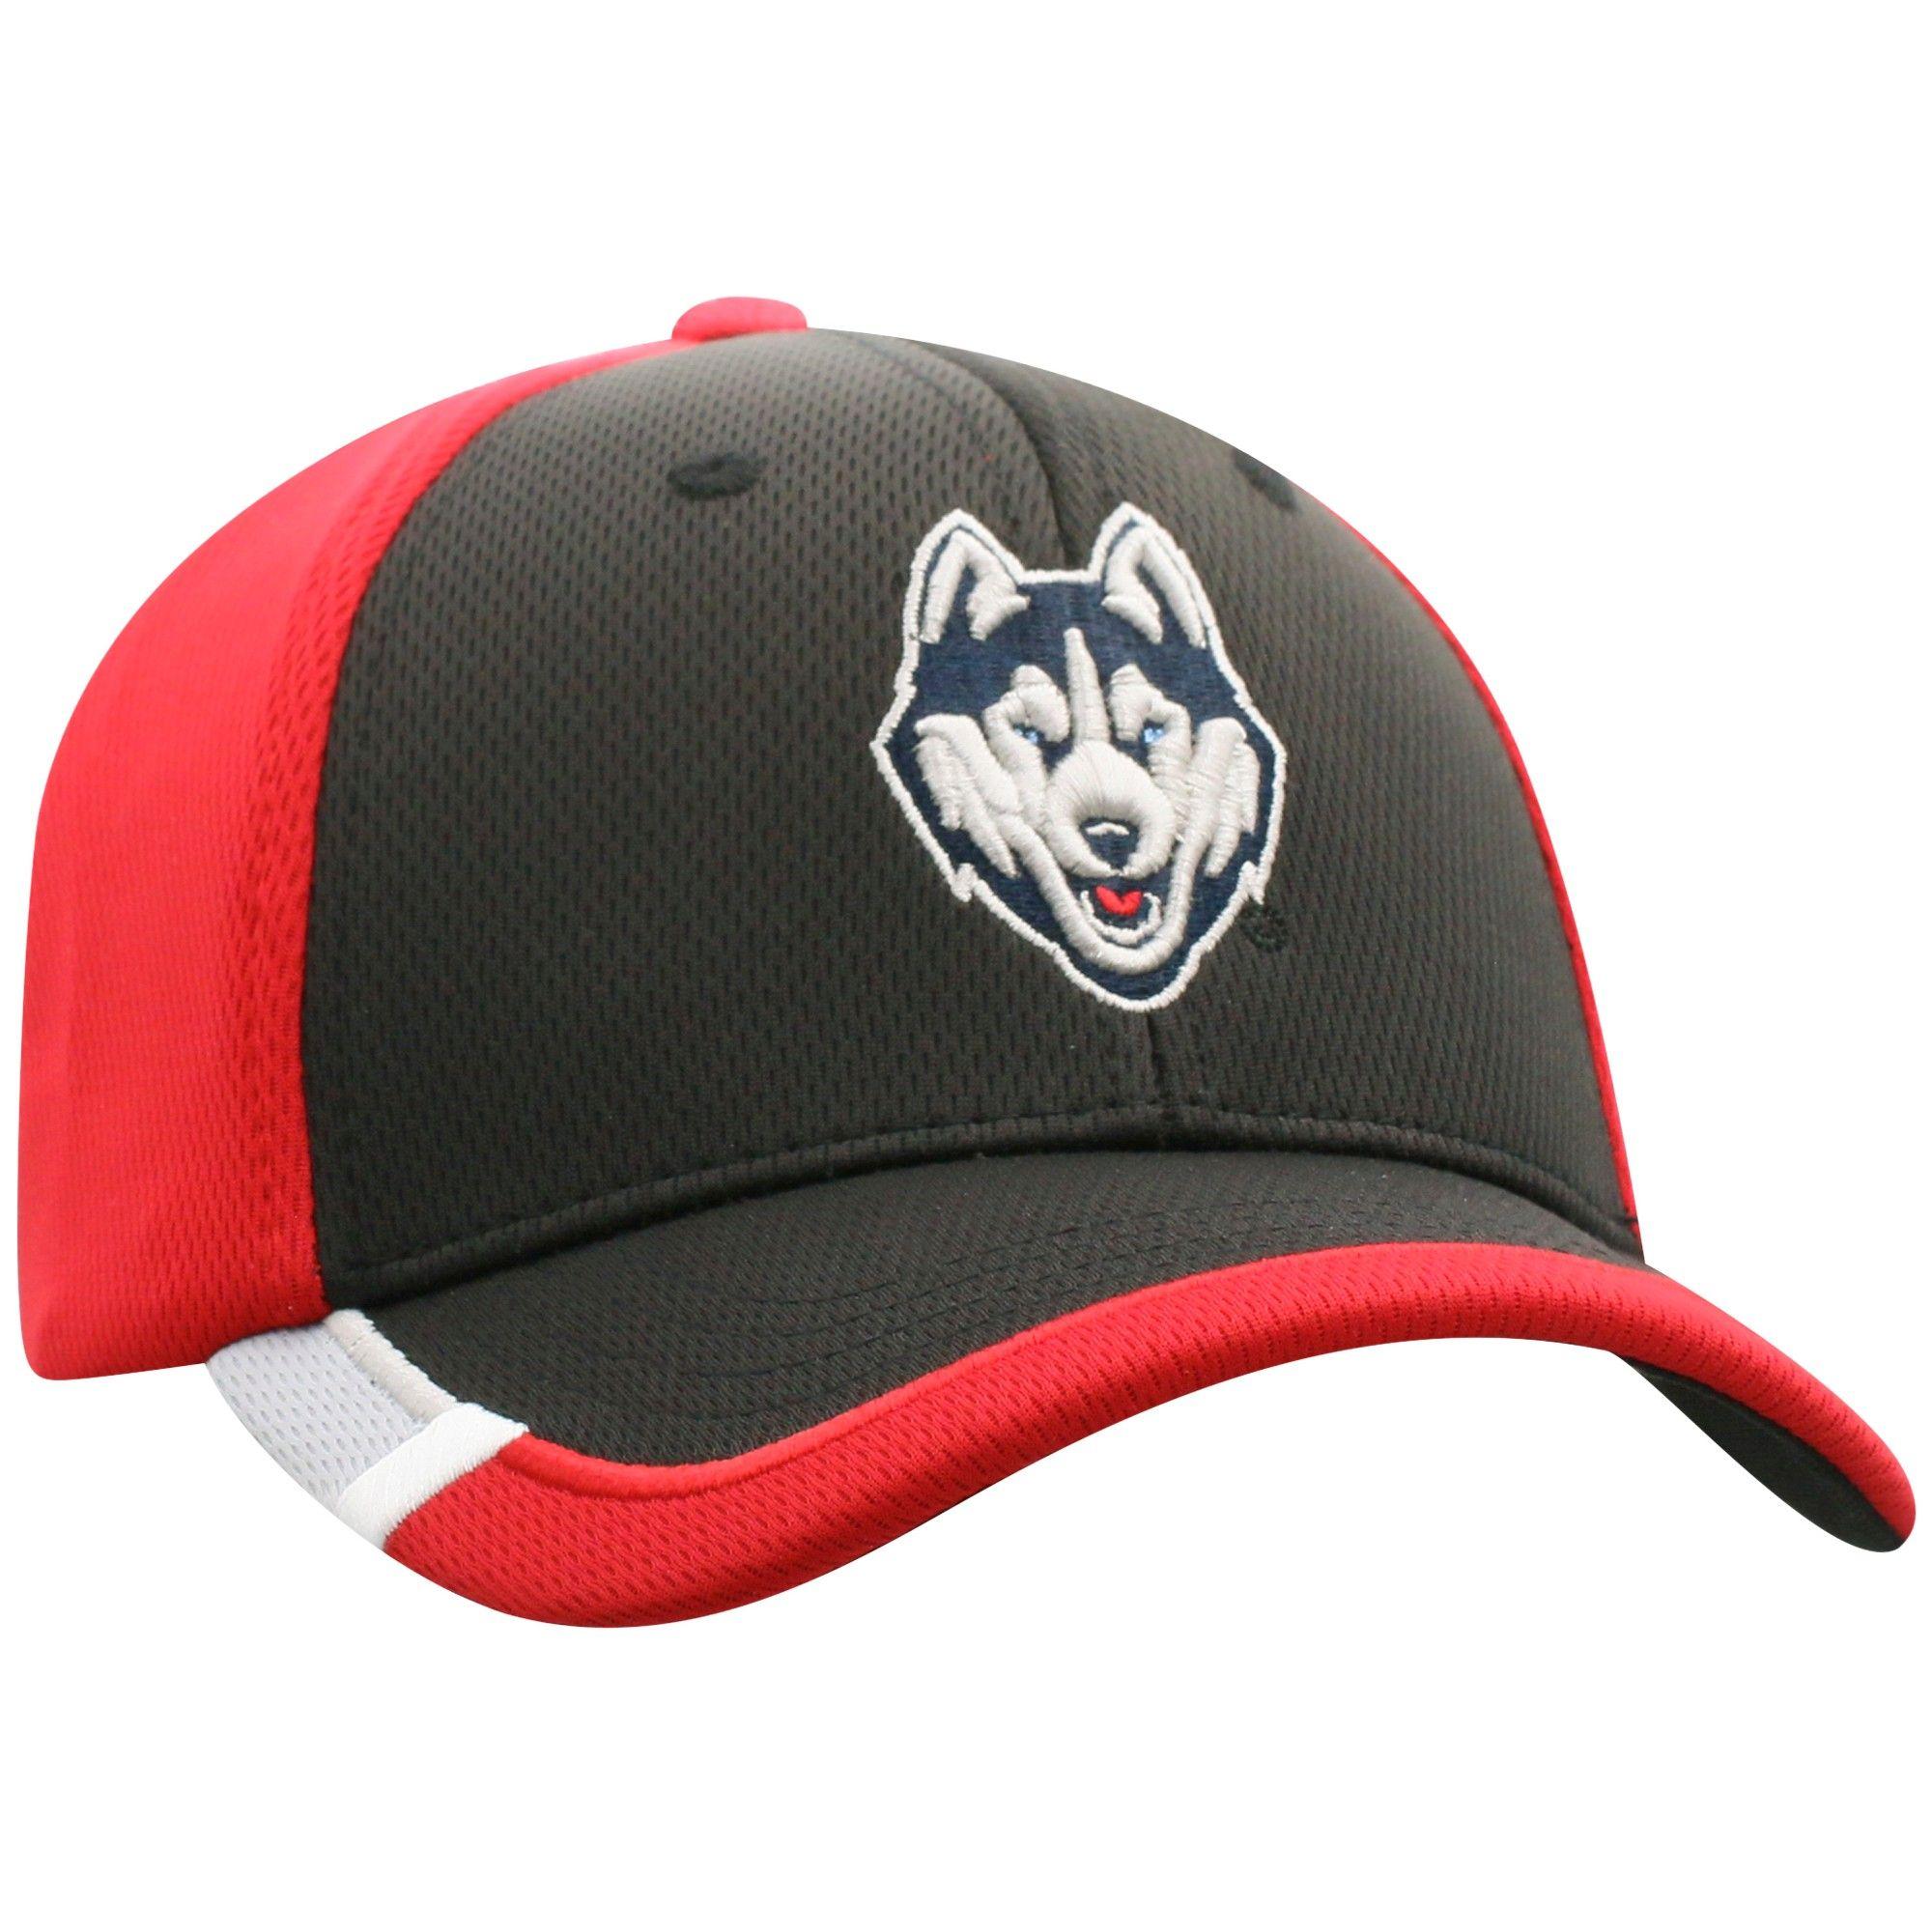 100% authentic 597d2 10eda NCAA Boys  UConn Huskies Topper Hat